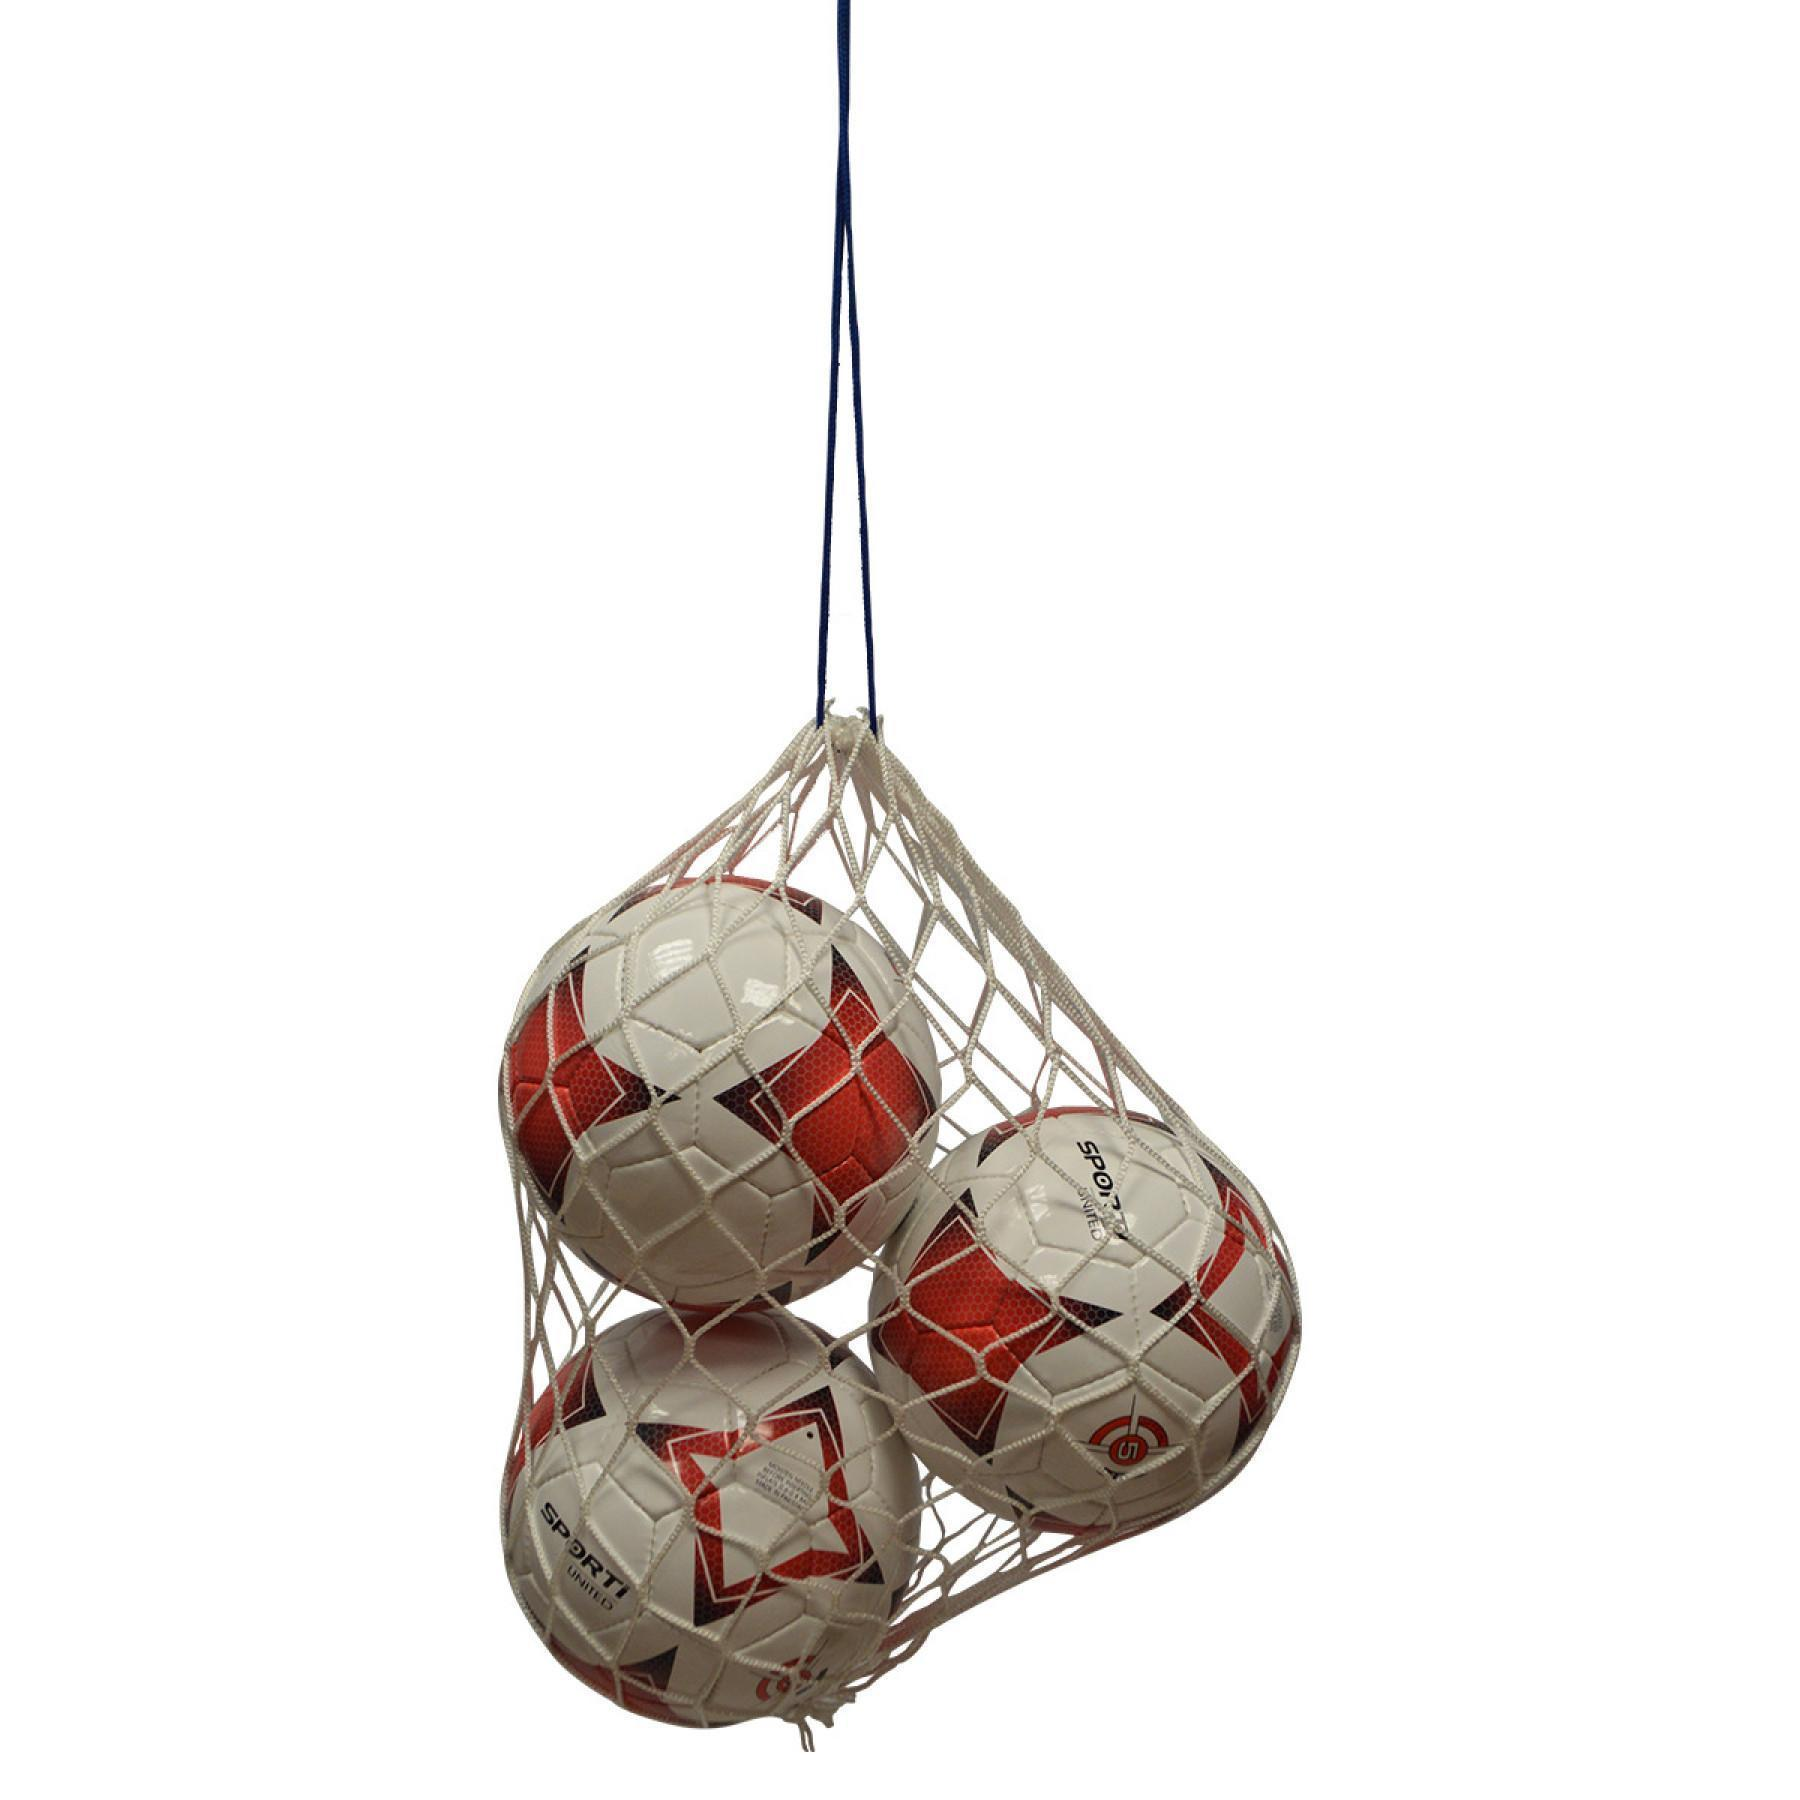 Balloon net (2/3 balloons) Sporti France